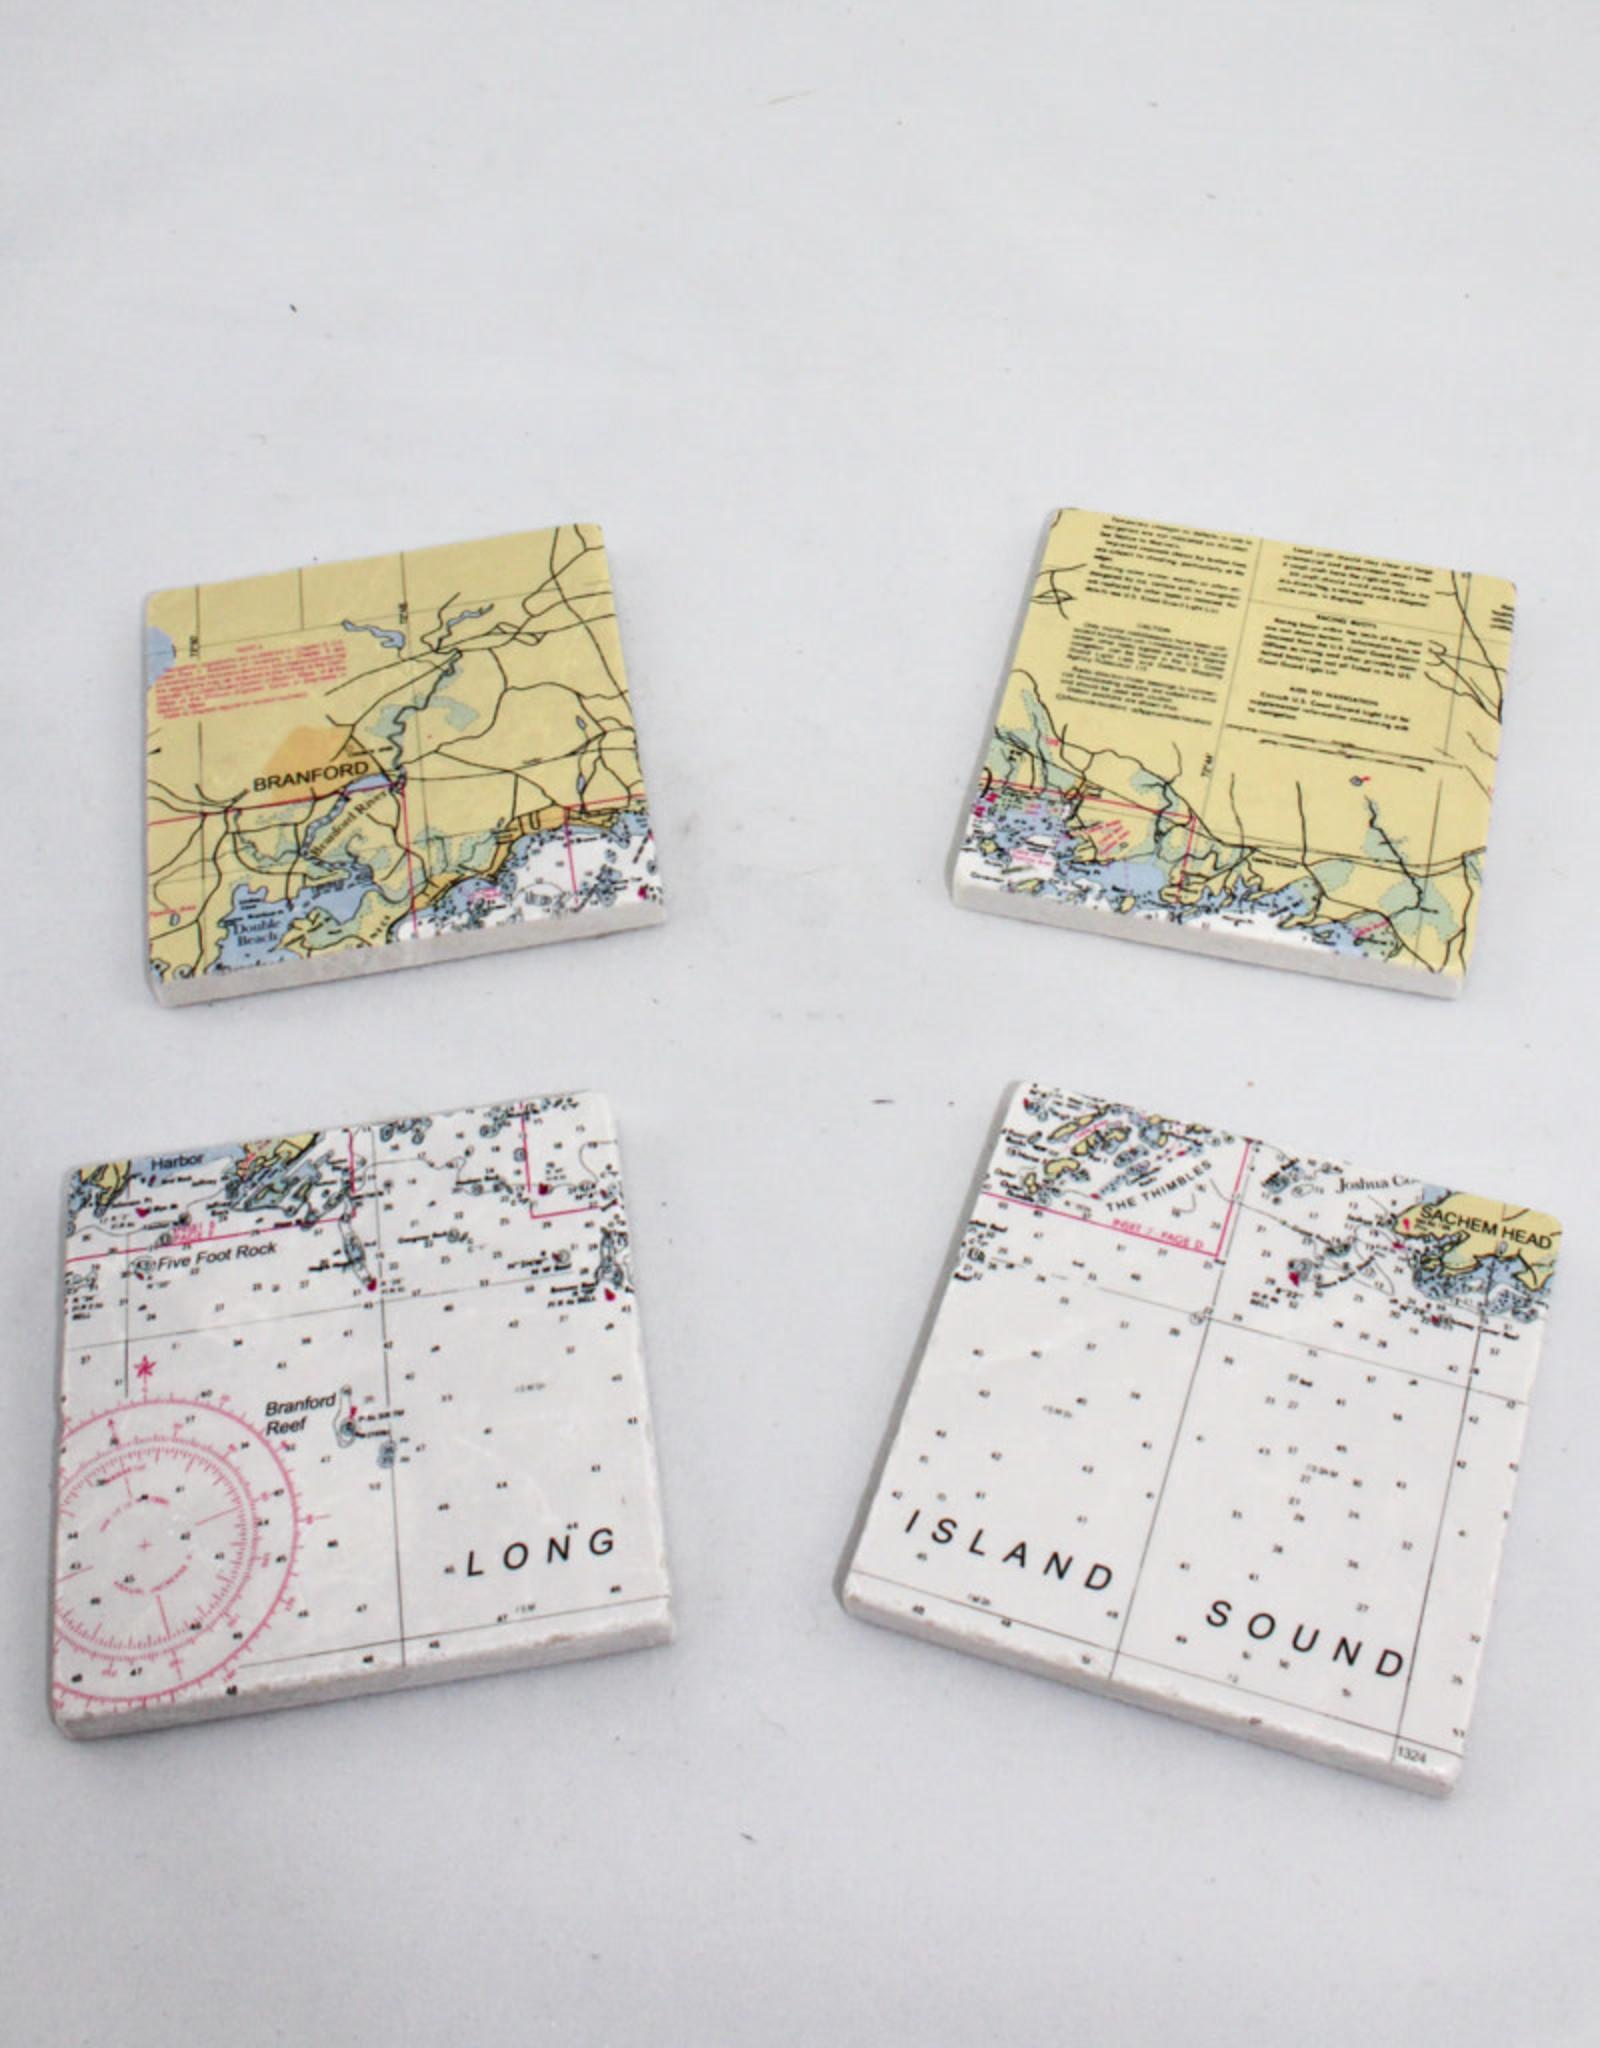 Screen Craft Tile Works Branford Map tile coasters